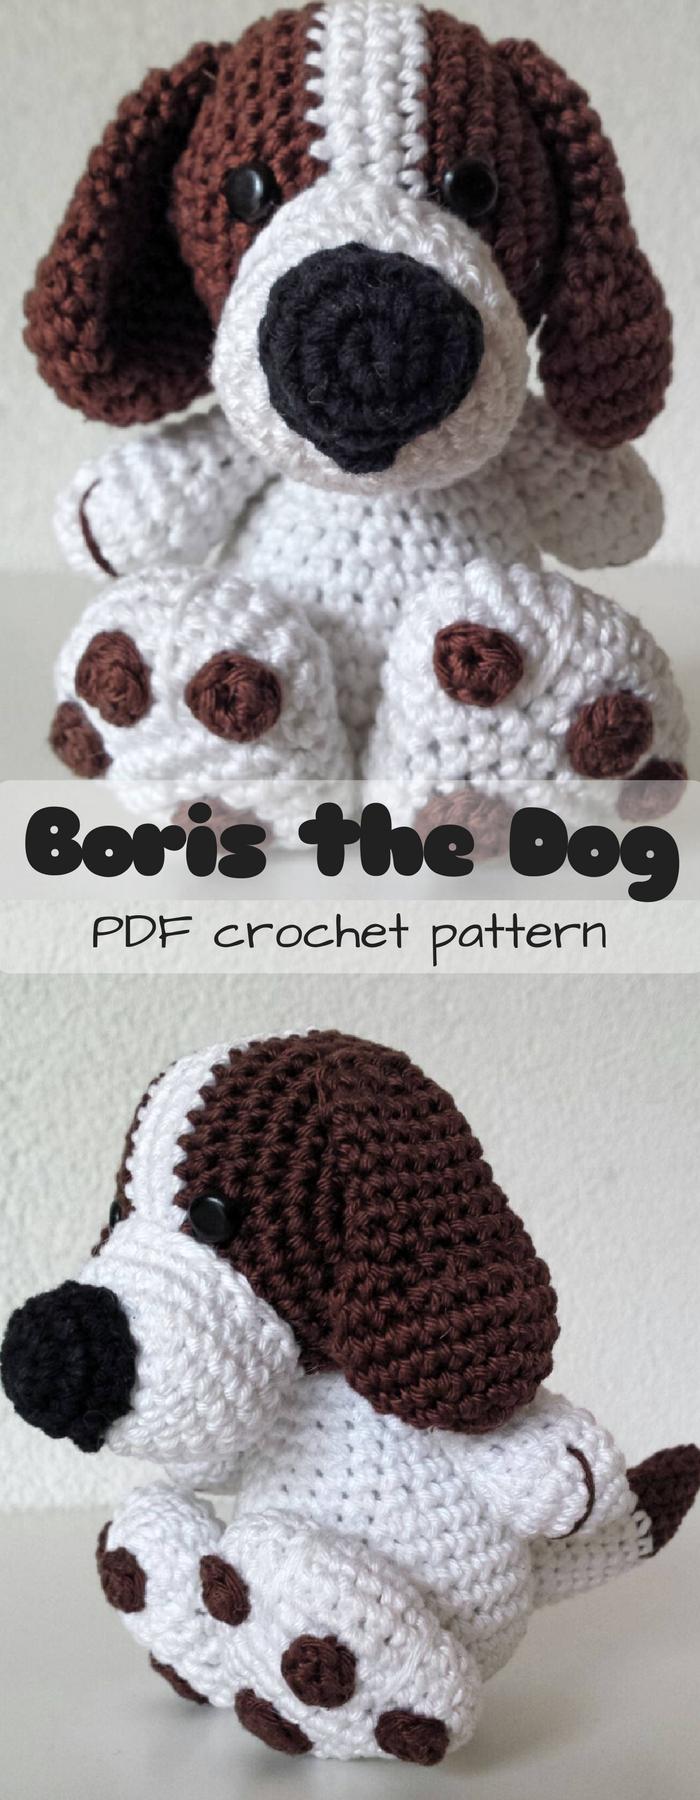 He\'s SOOOOOO CUTE!!!! What an adorable crochet puppy toy! Such a ...